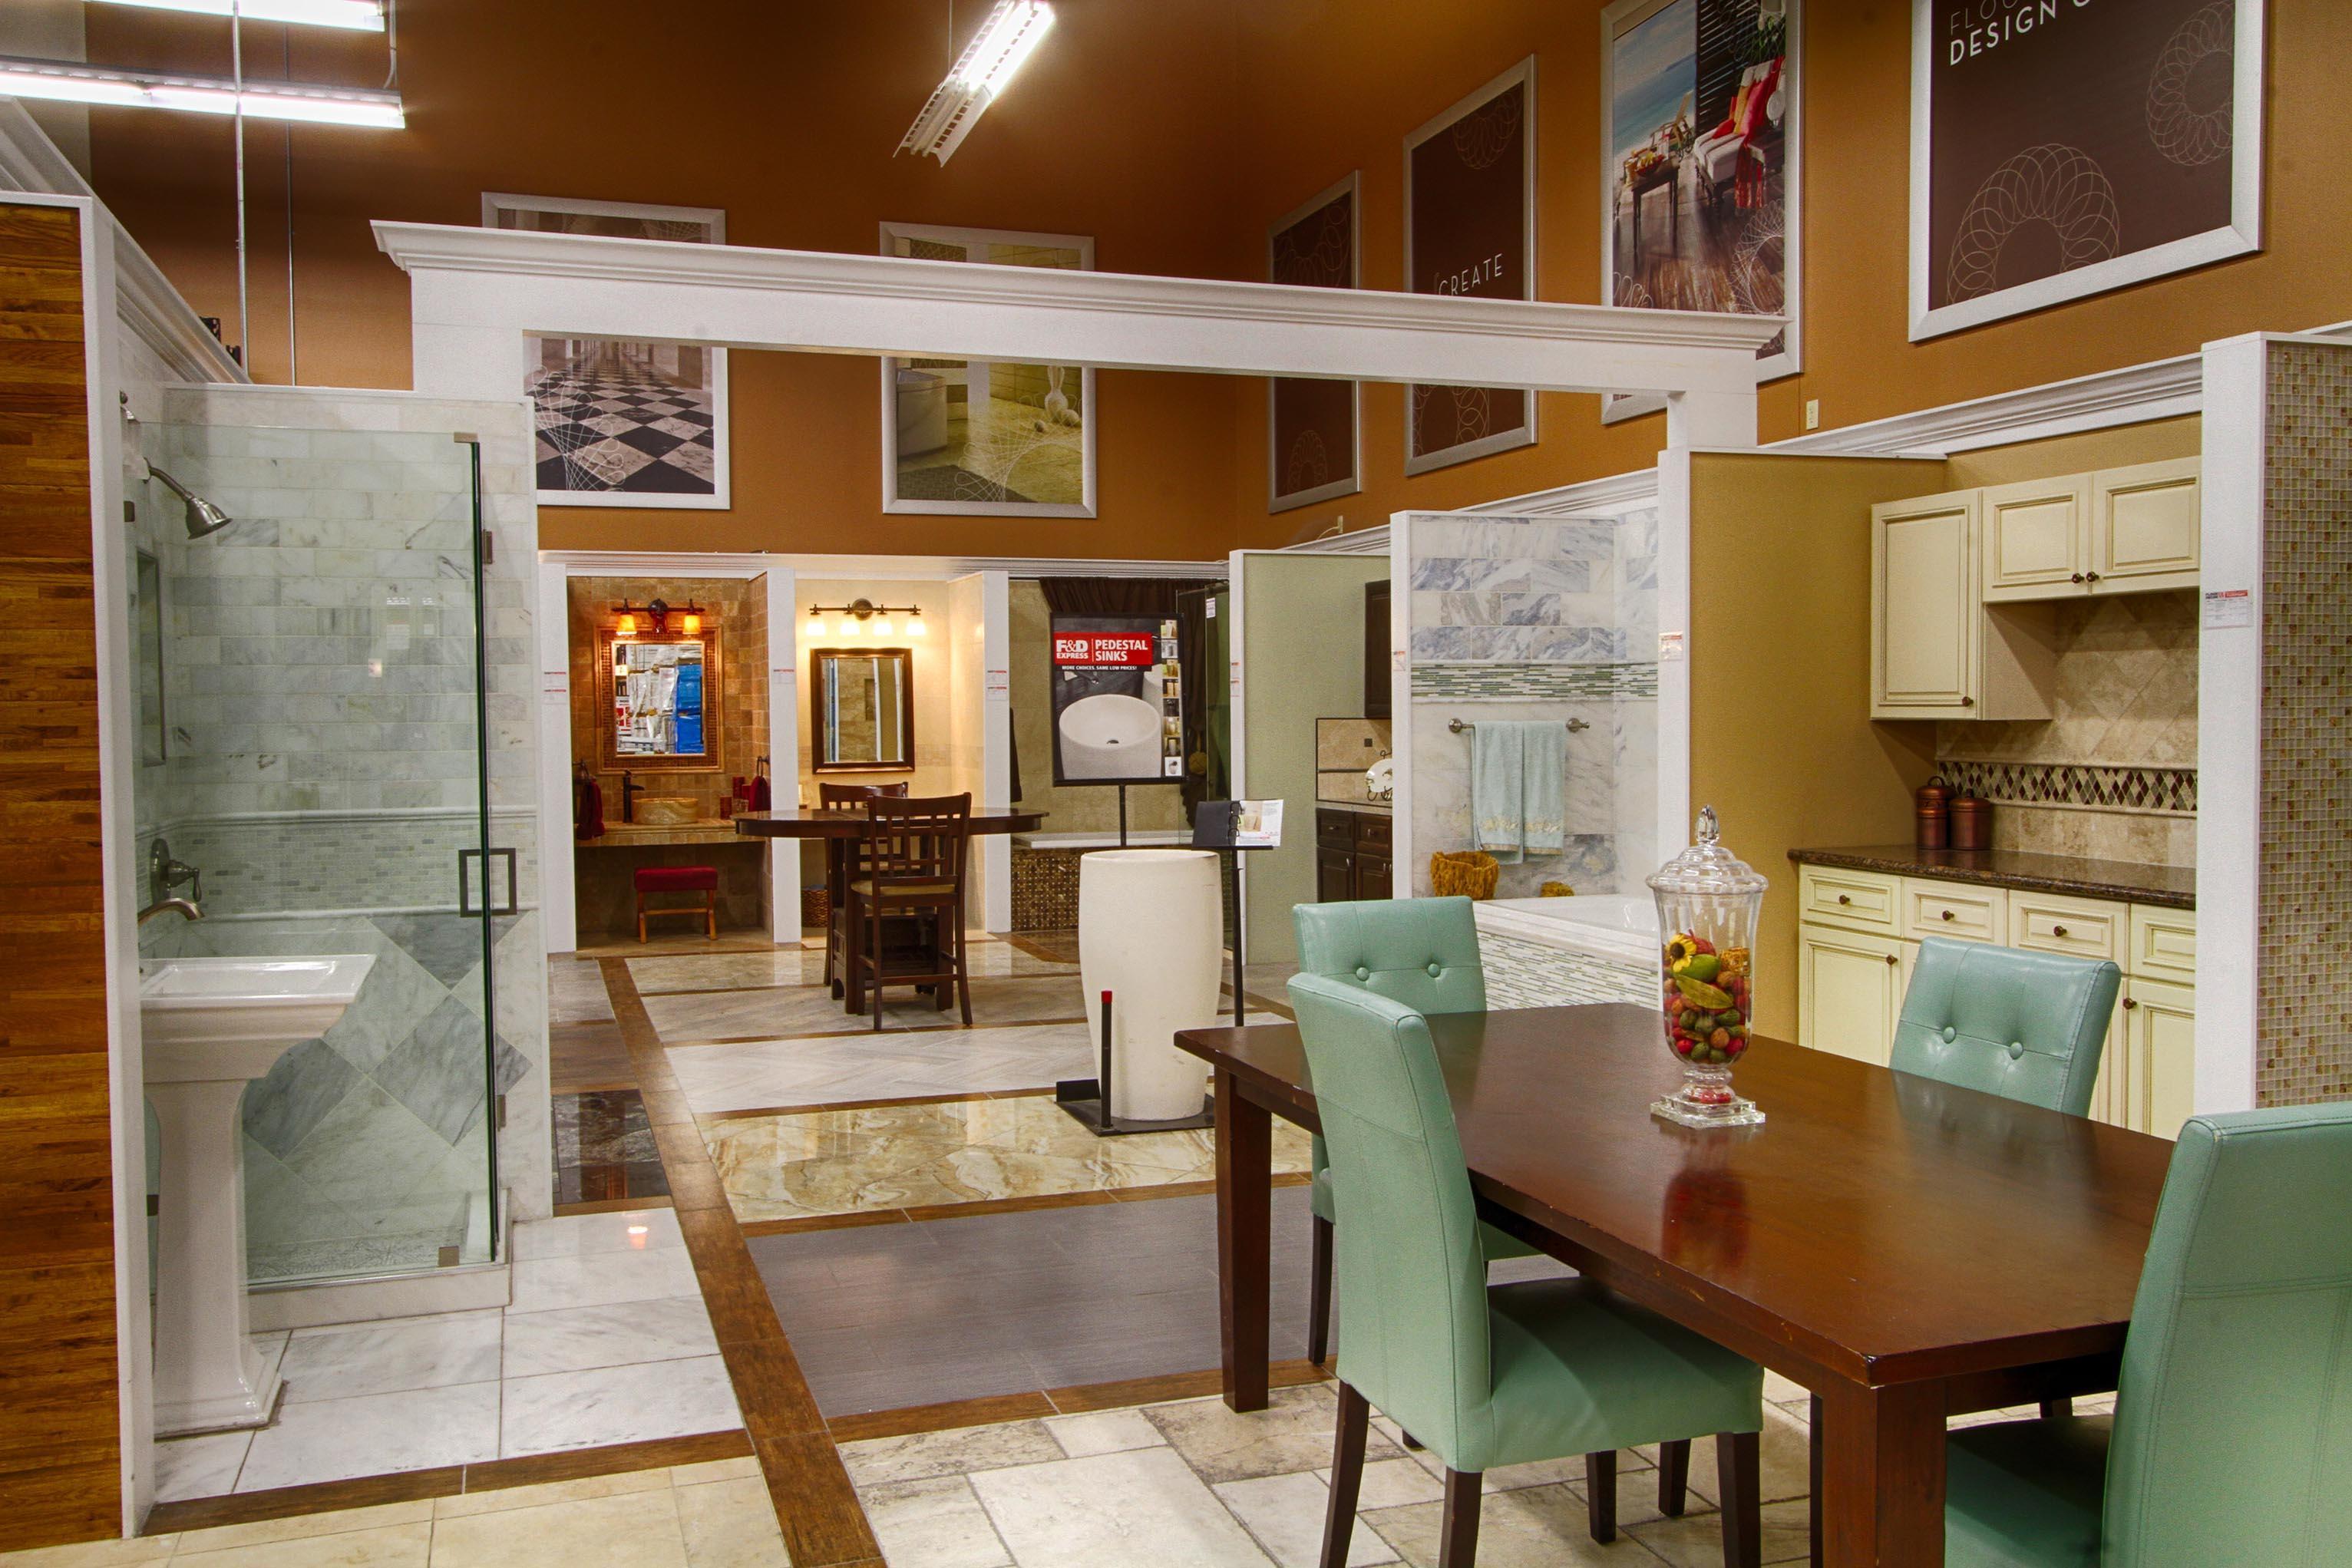 Floor Decor 13650 Pines Blvd Pembroke Pines Fl Flooring